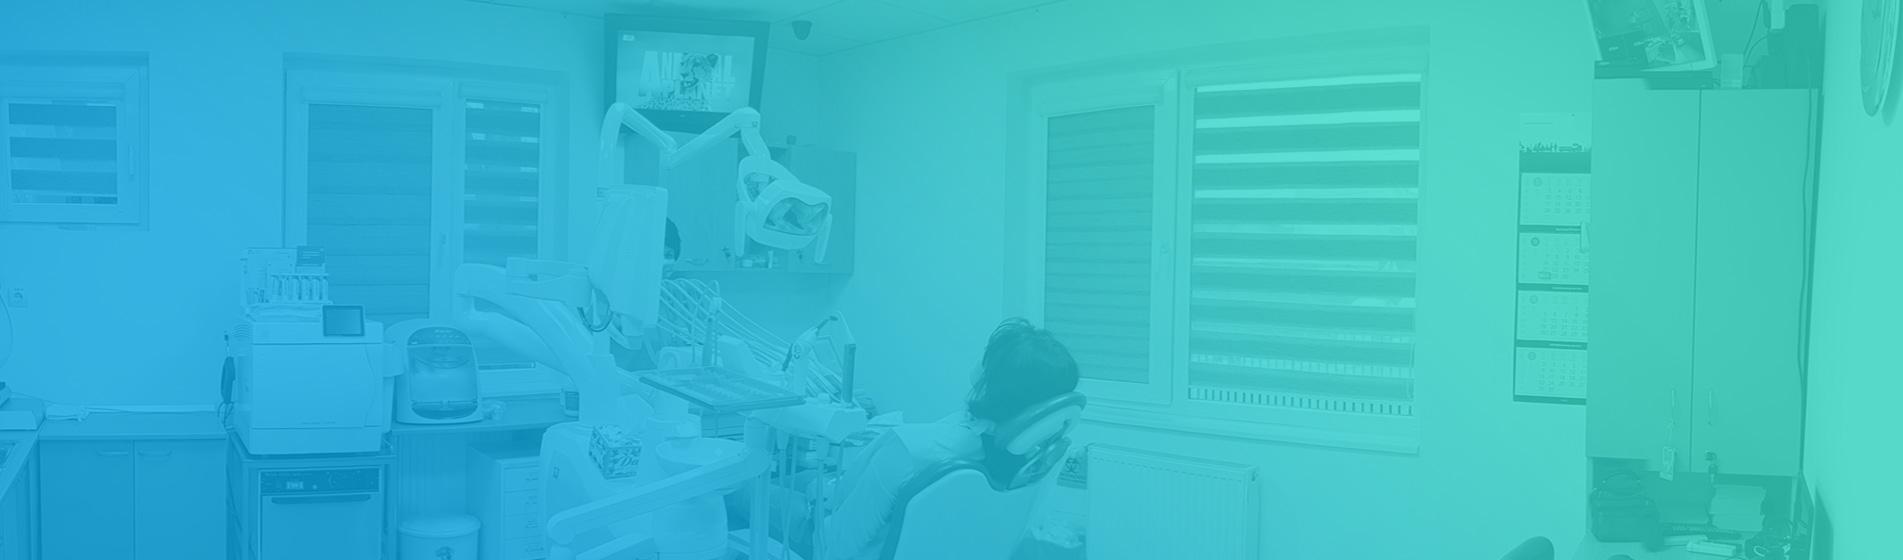 cabinet stomatologic Ploiesti - implant dentar